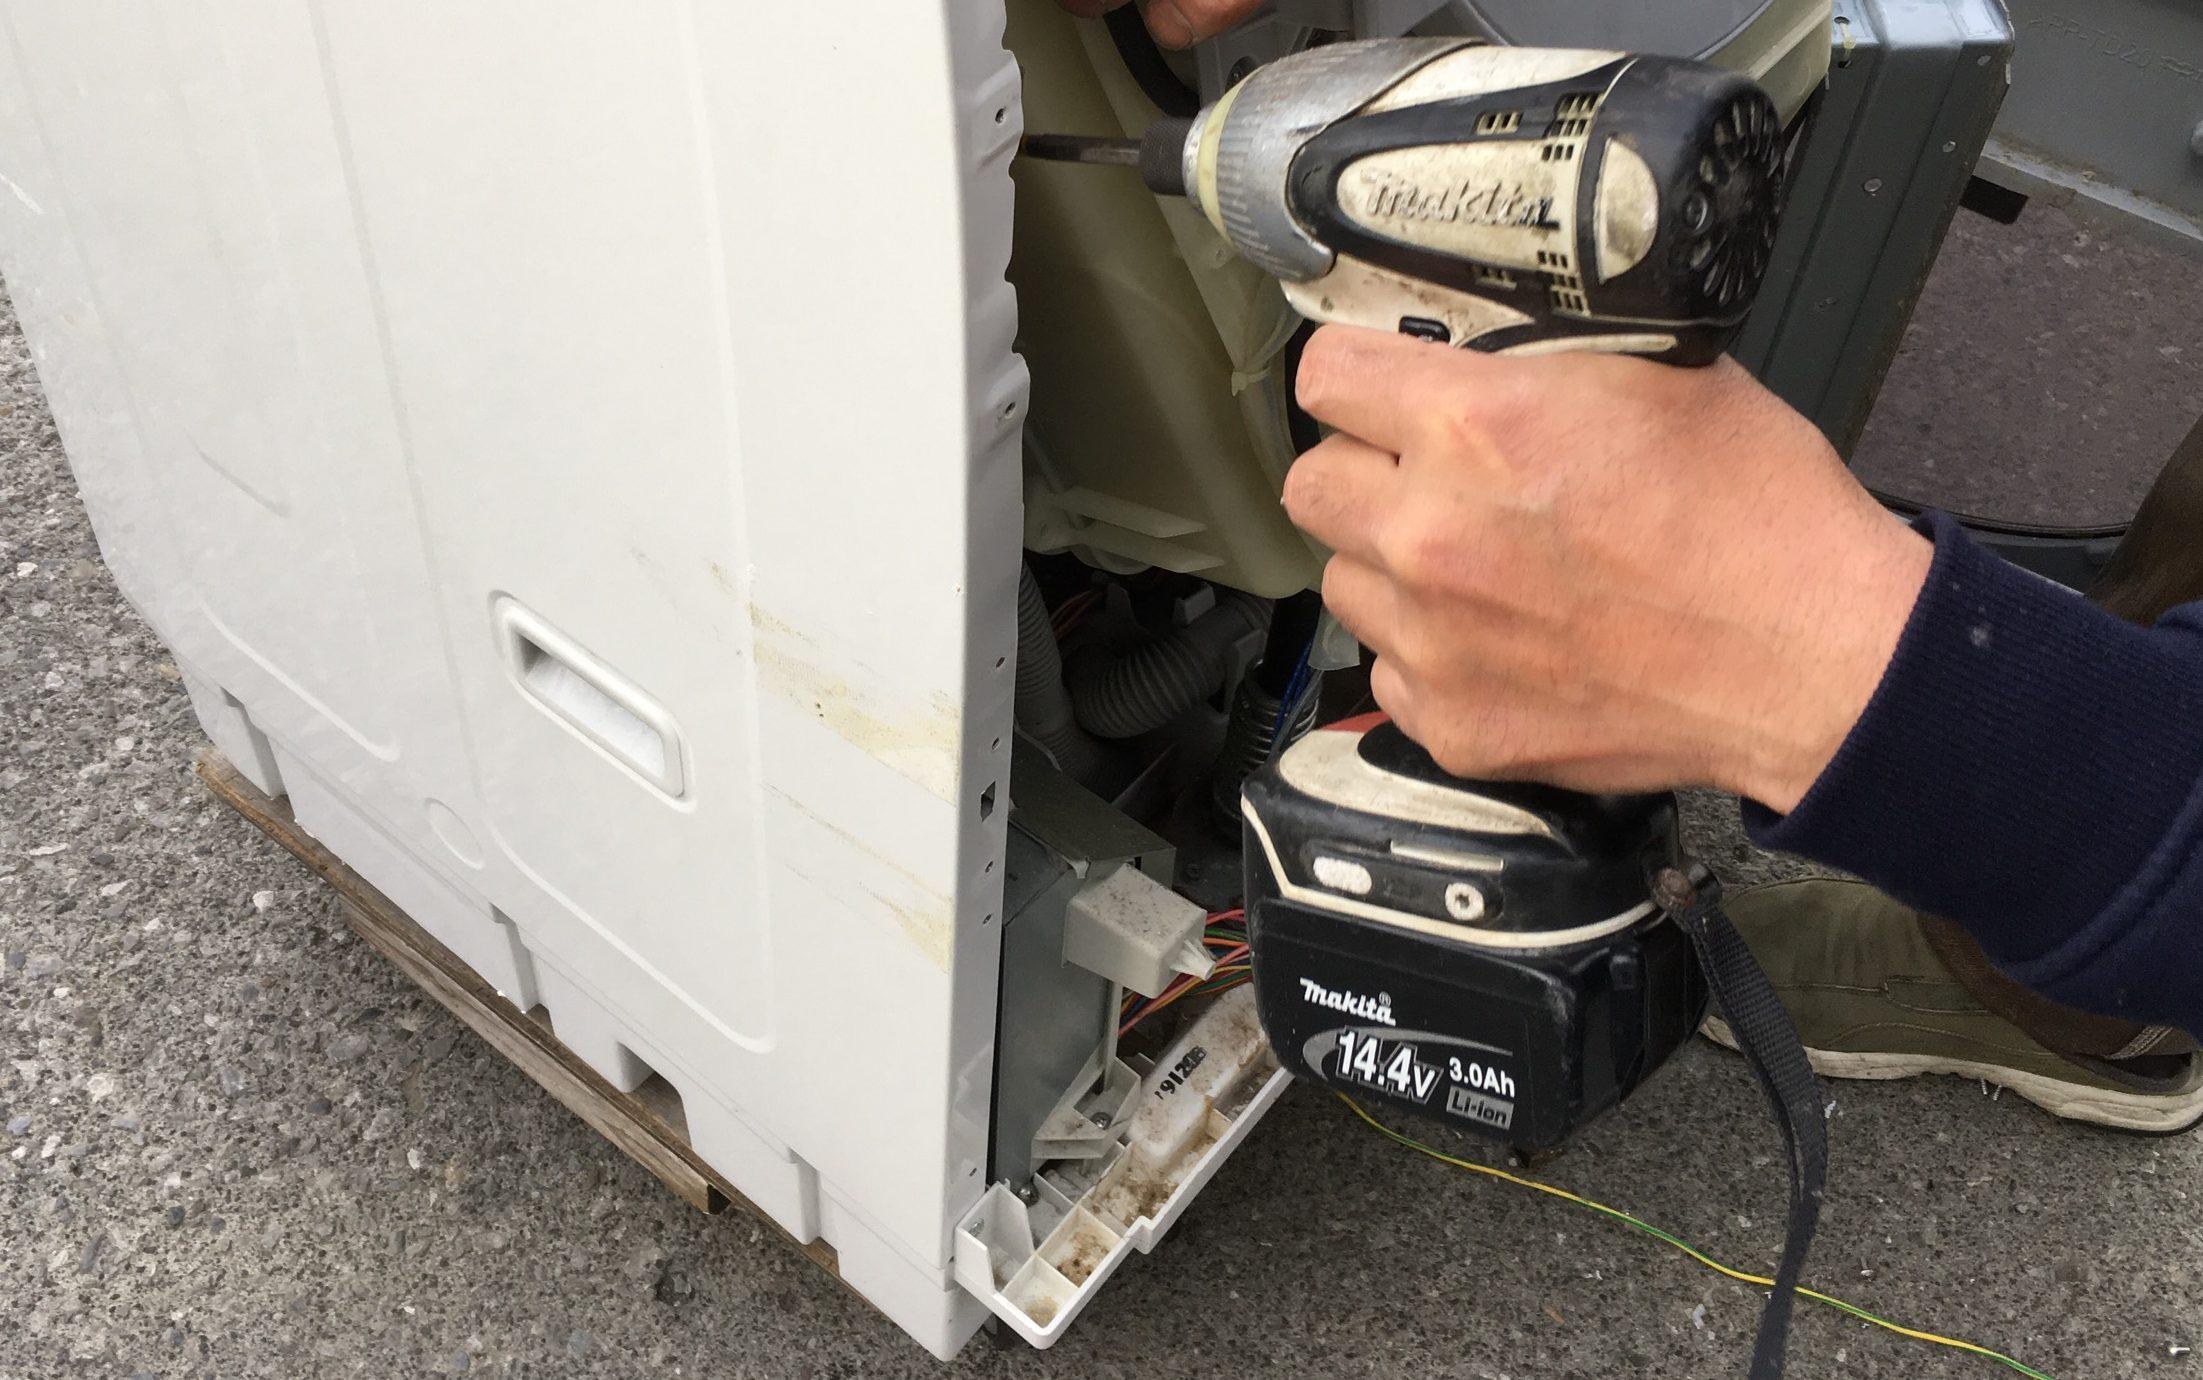 DIYで分解・修理する時に使う、おすすめの電動工具や道具の紹介